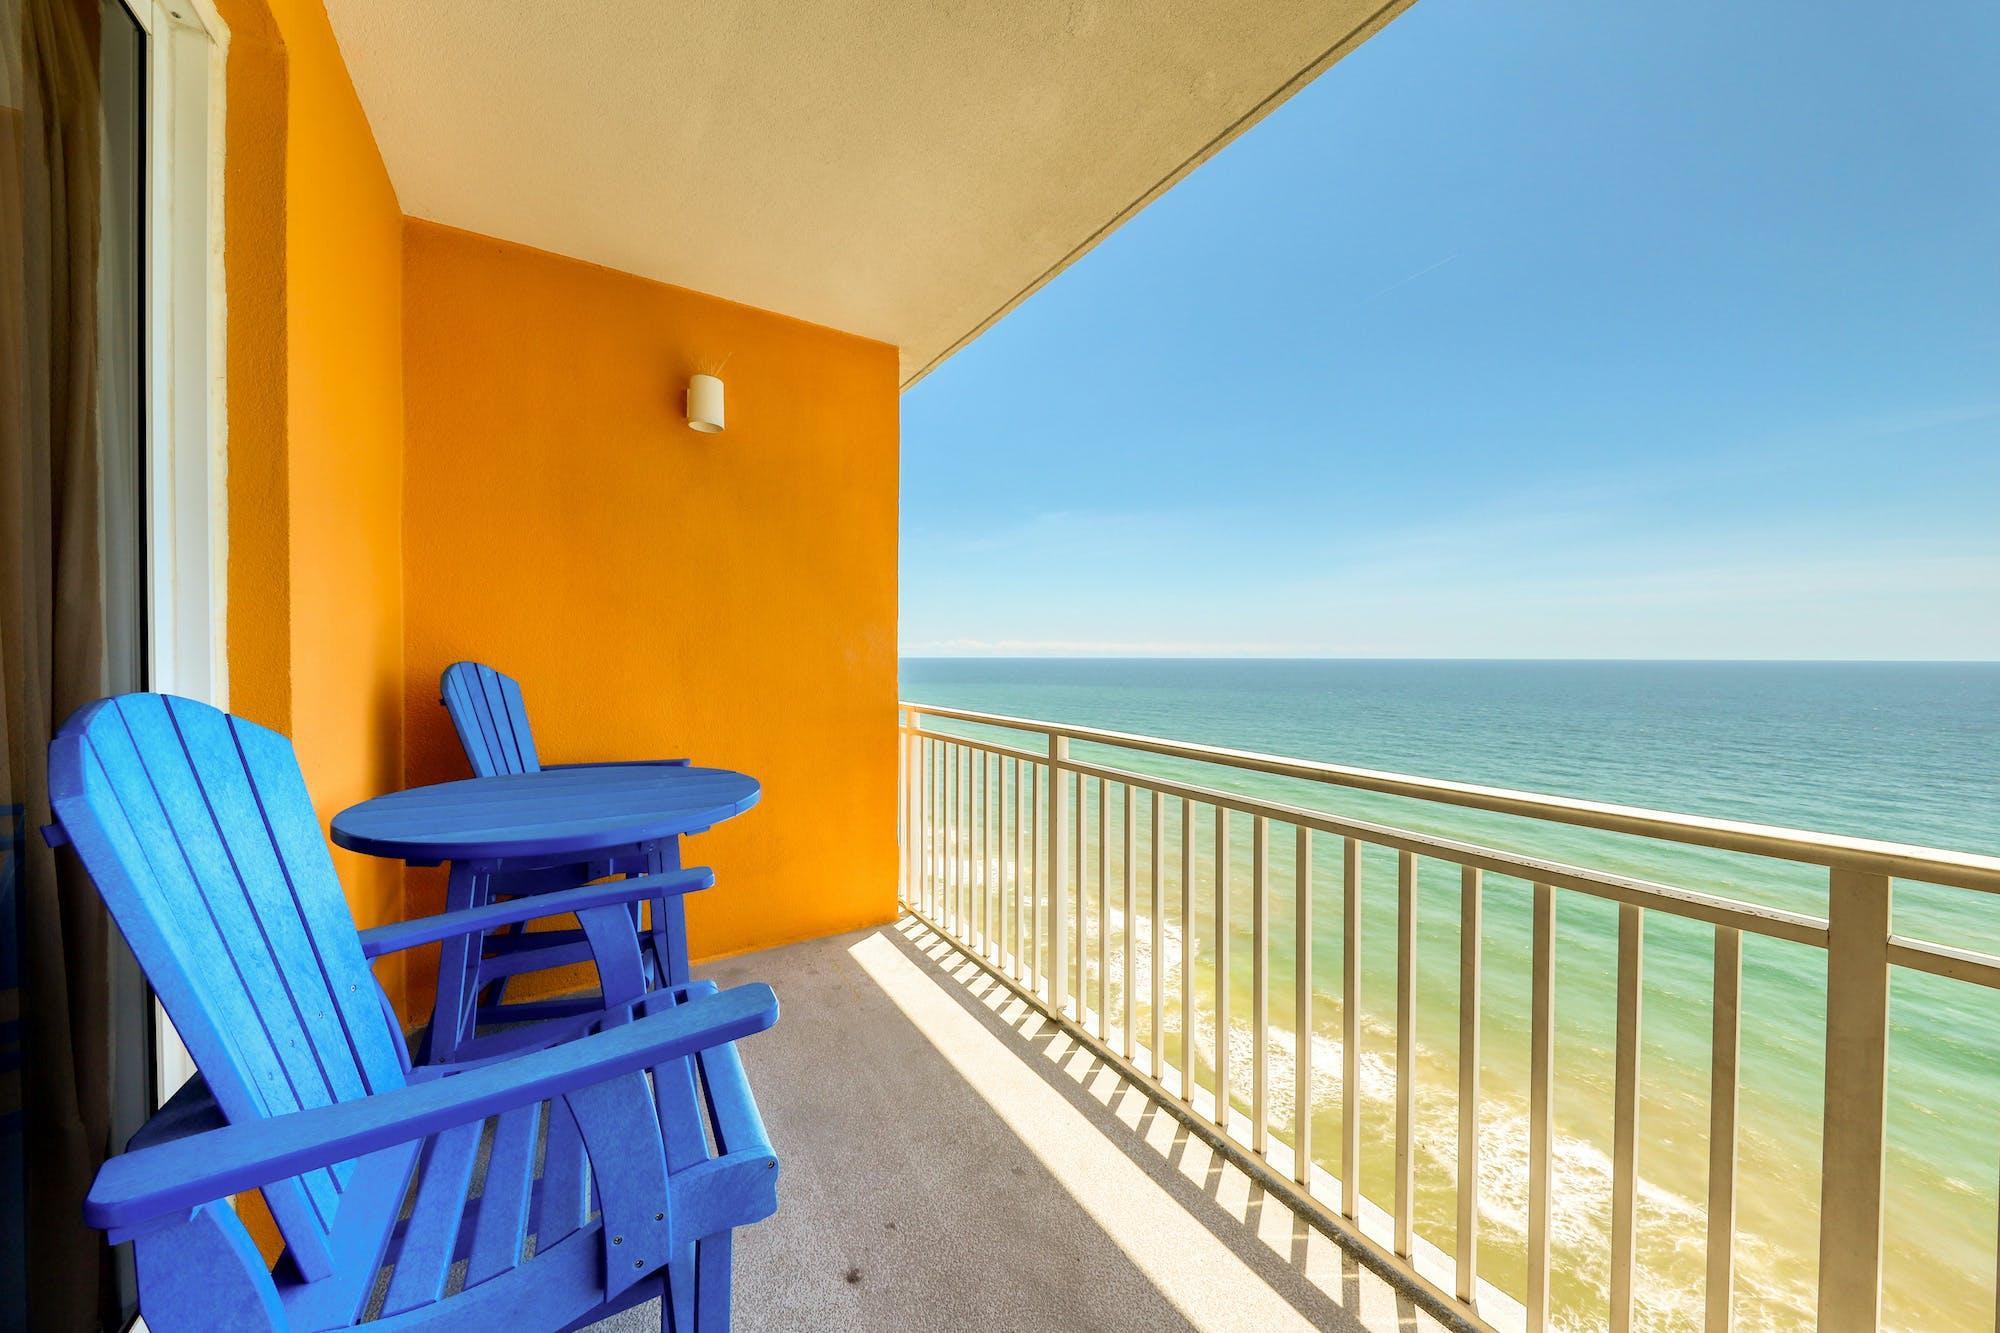 Panama City Beach, FL - Top Place to Buy a Vacation Home | Vacasa